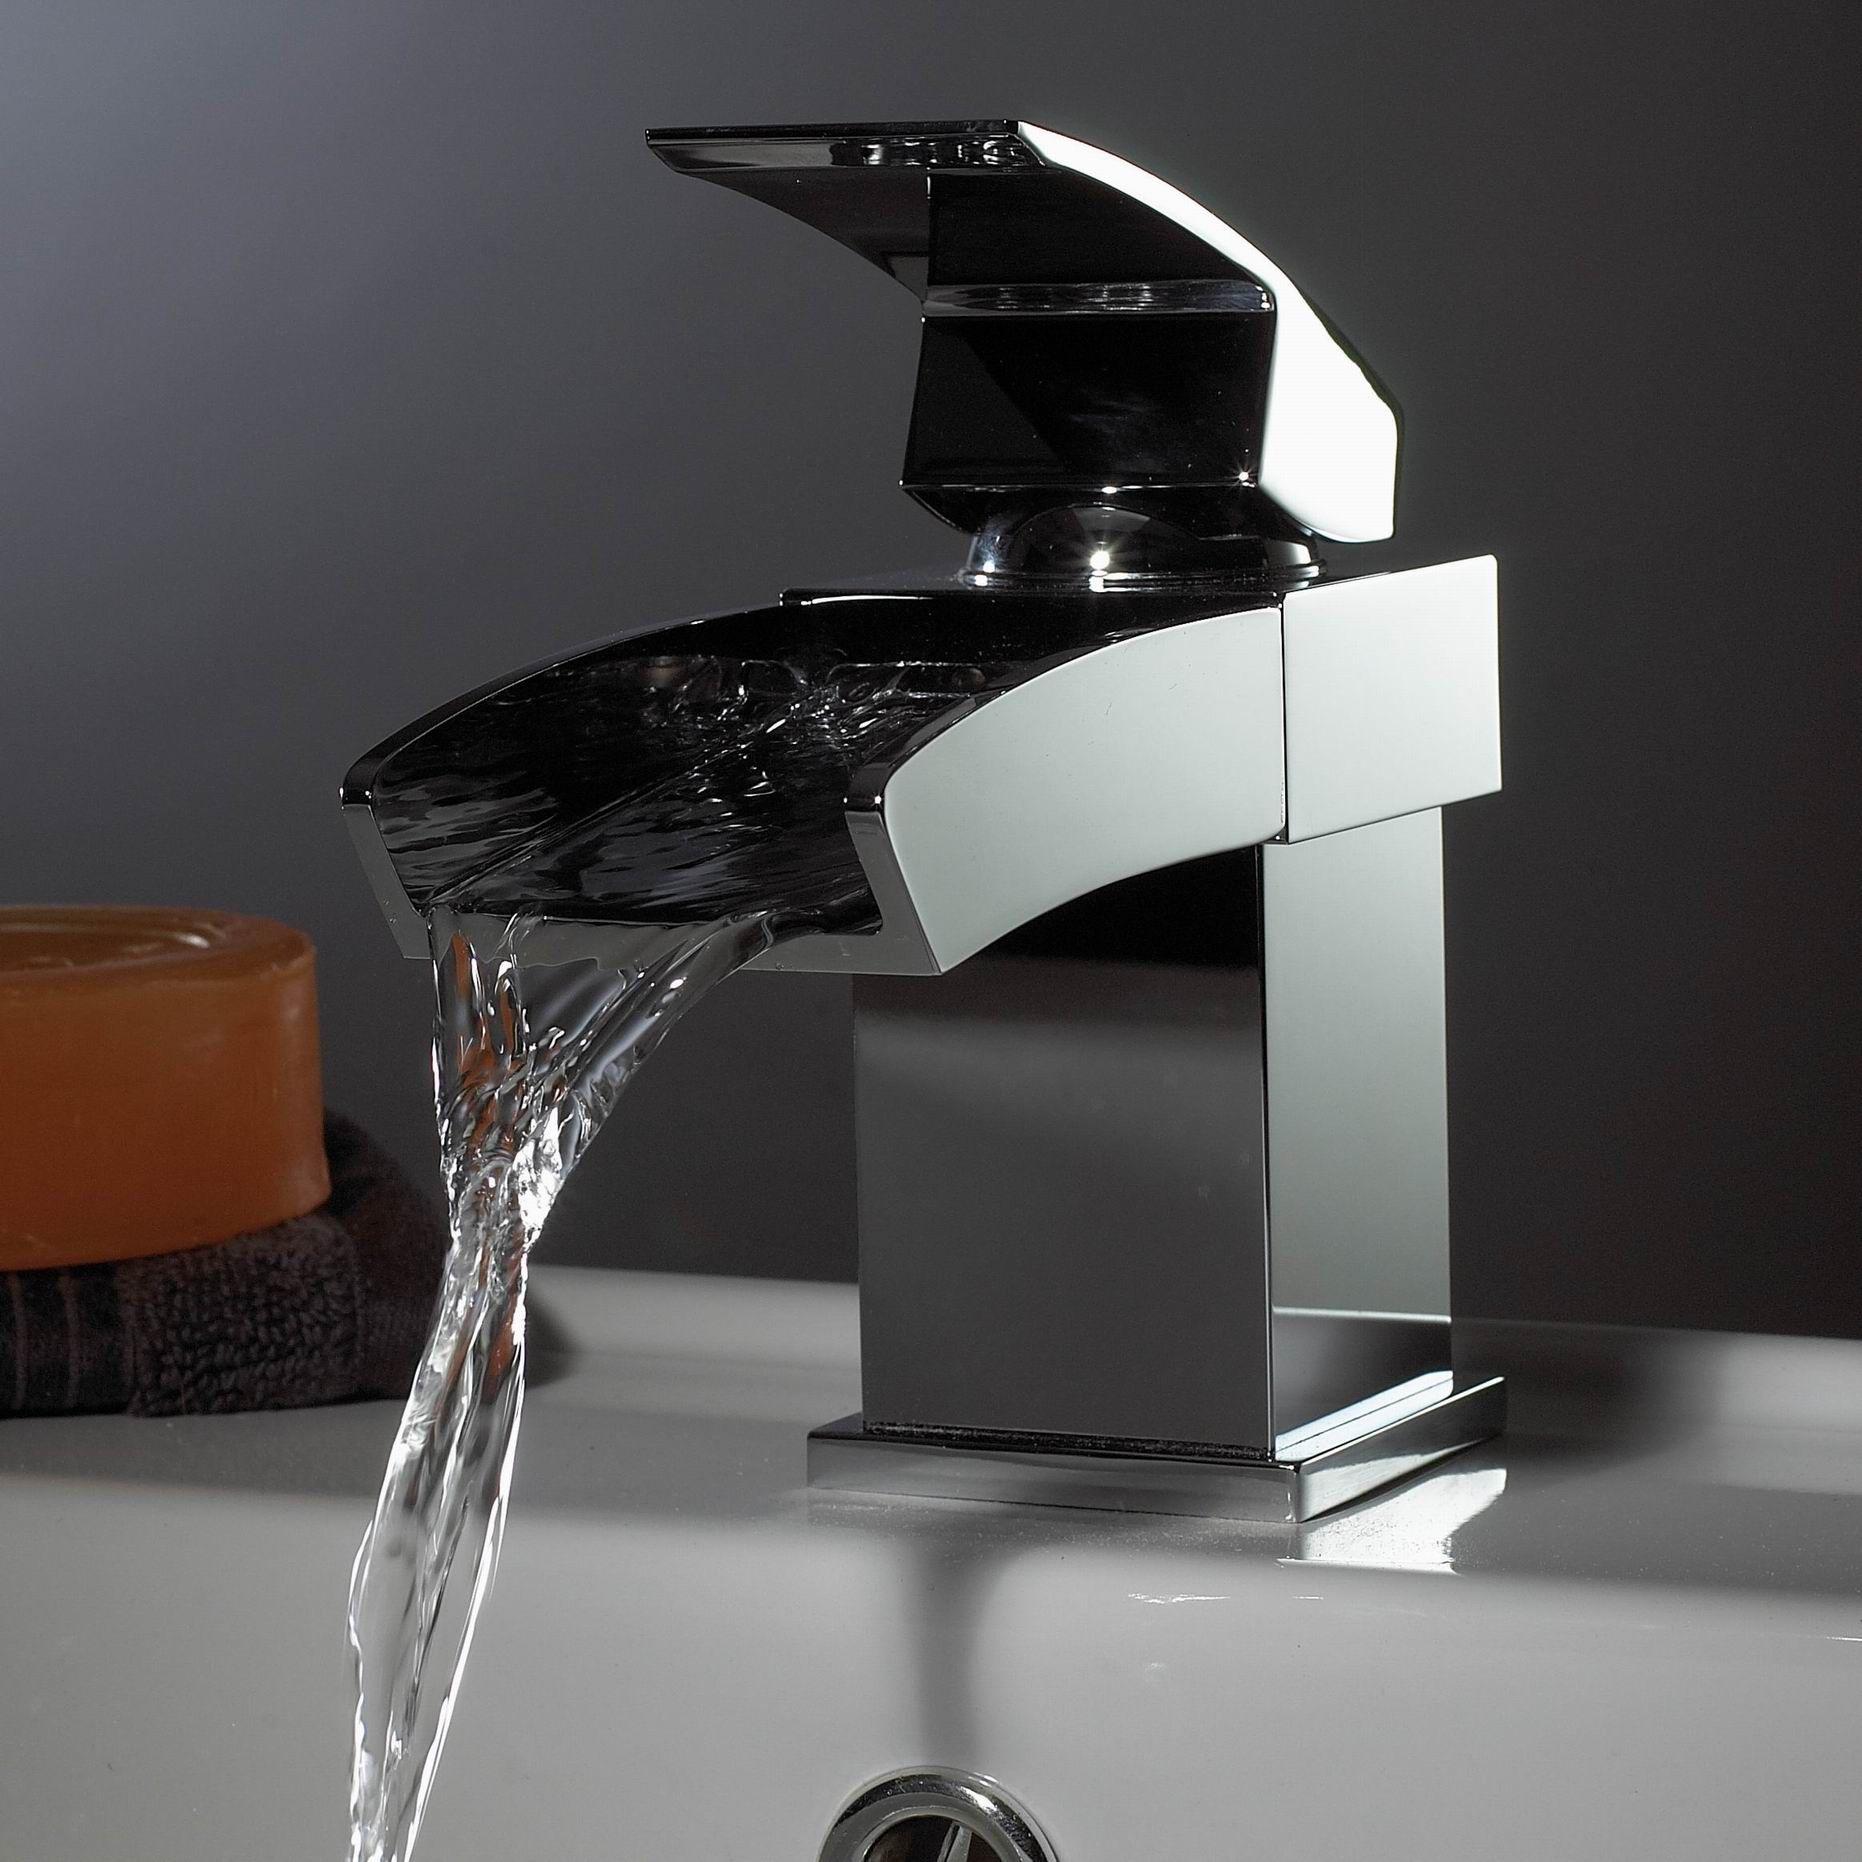 High Utility And Functionality Bathroom Taps Anlamli Net In 2020 Modern Bathroom Decor Modern Bathroom Bathroom Decor Pictures